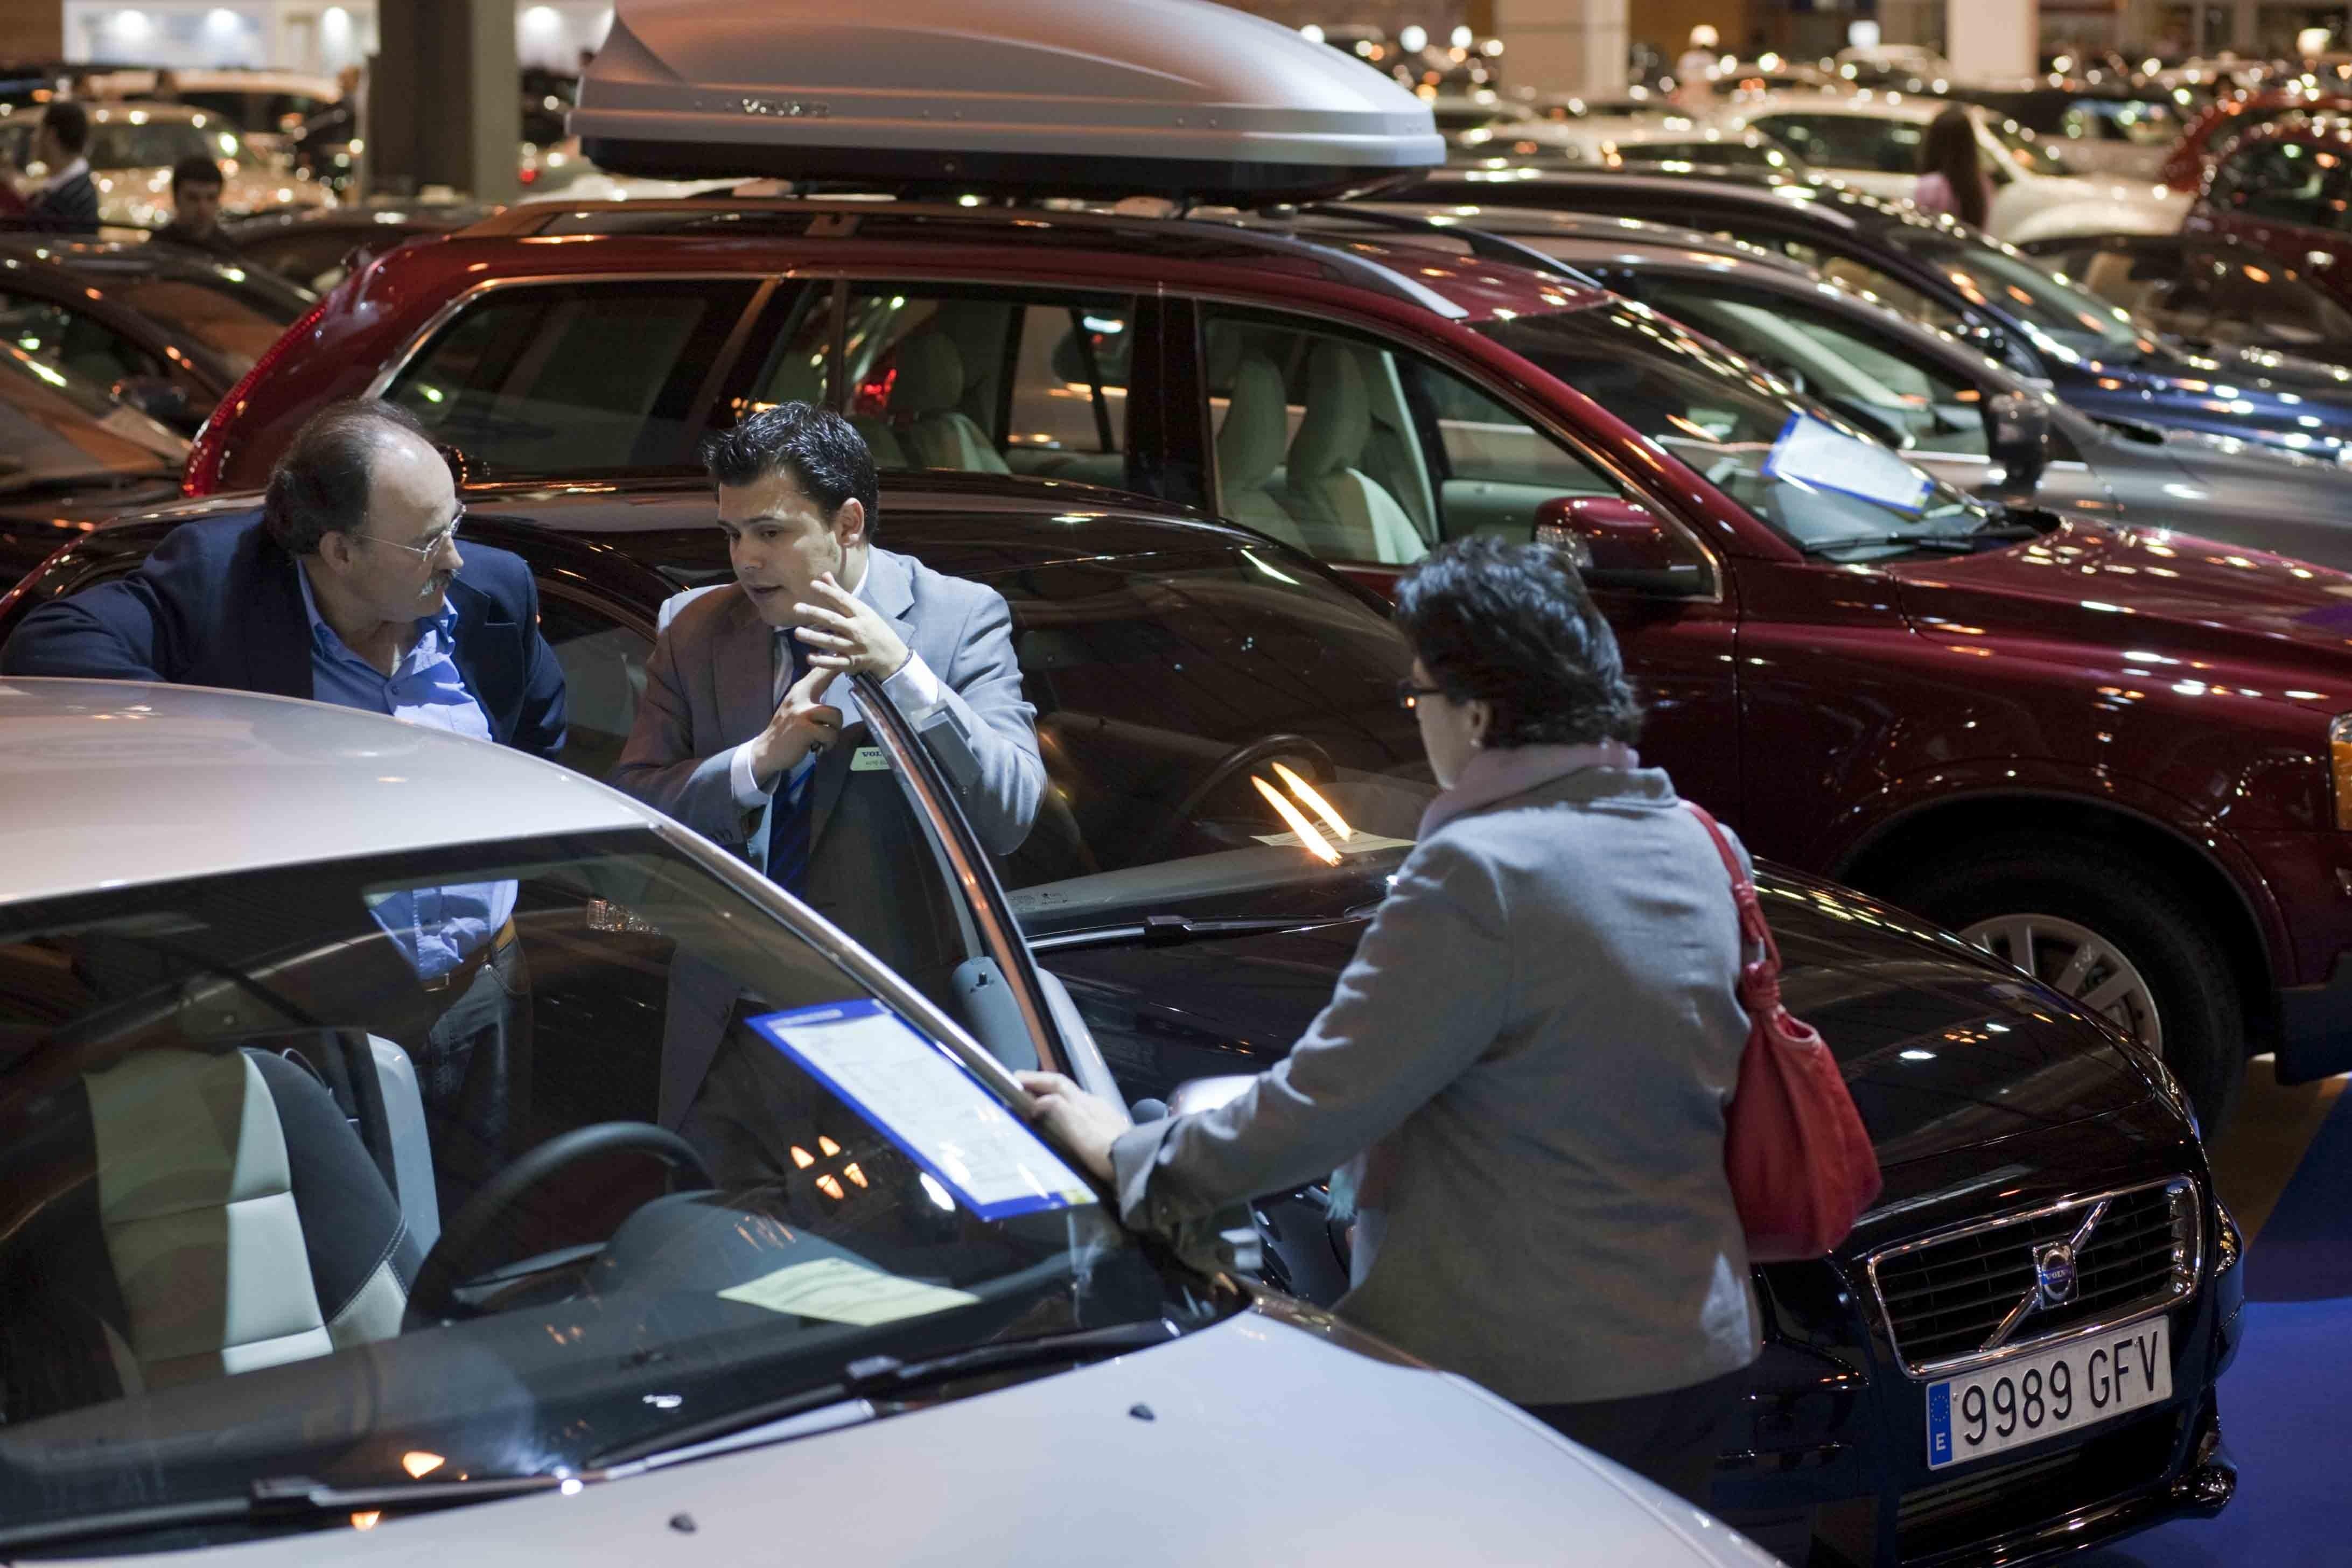 Las ventas de coches usados en Andalucía crecen un 1,8% hasta agosto, según Ganvam